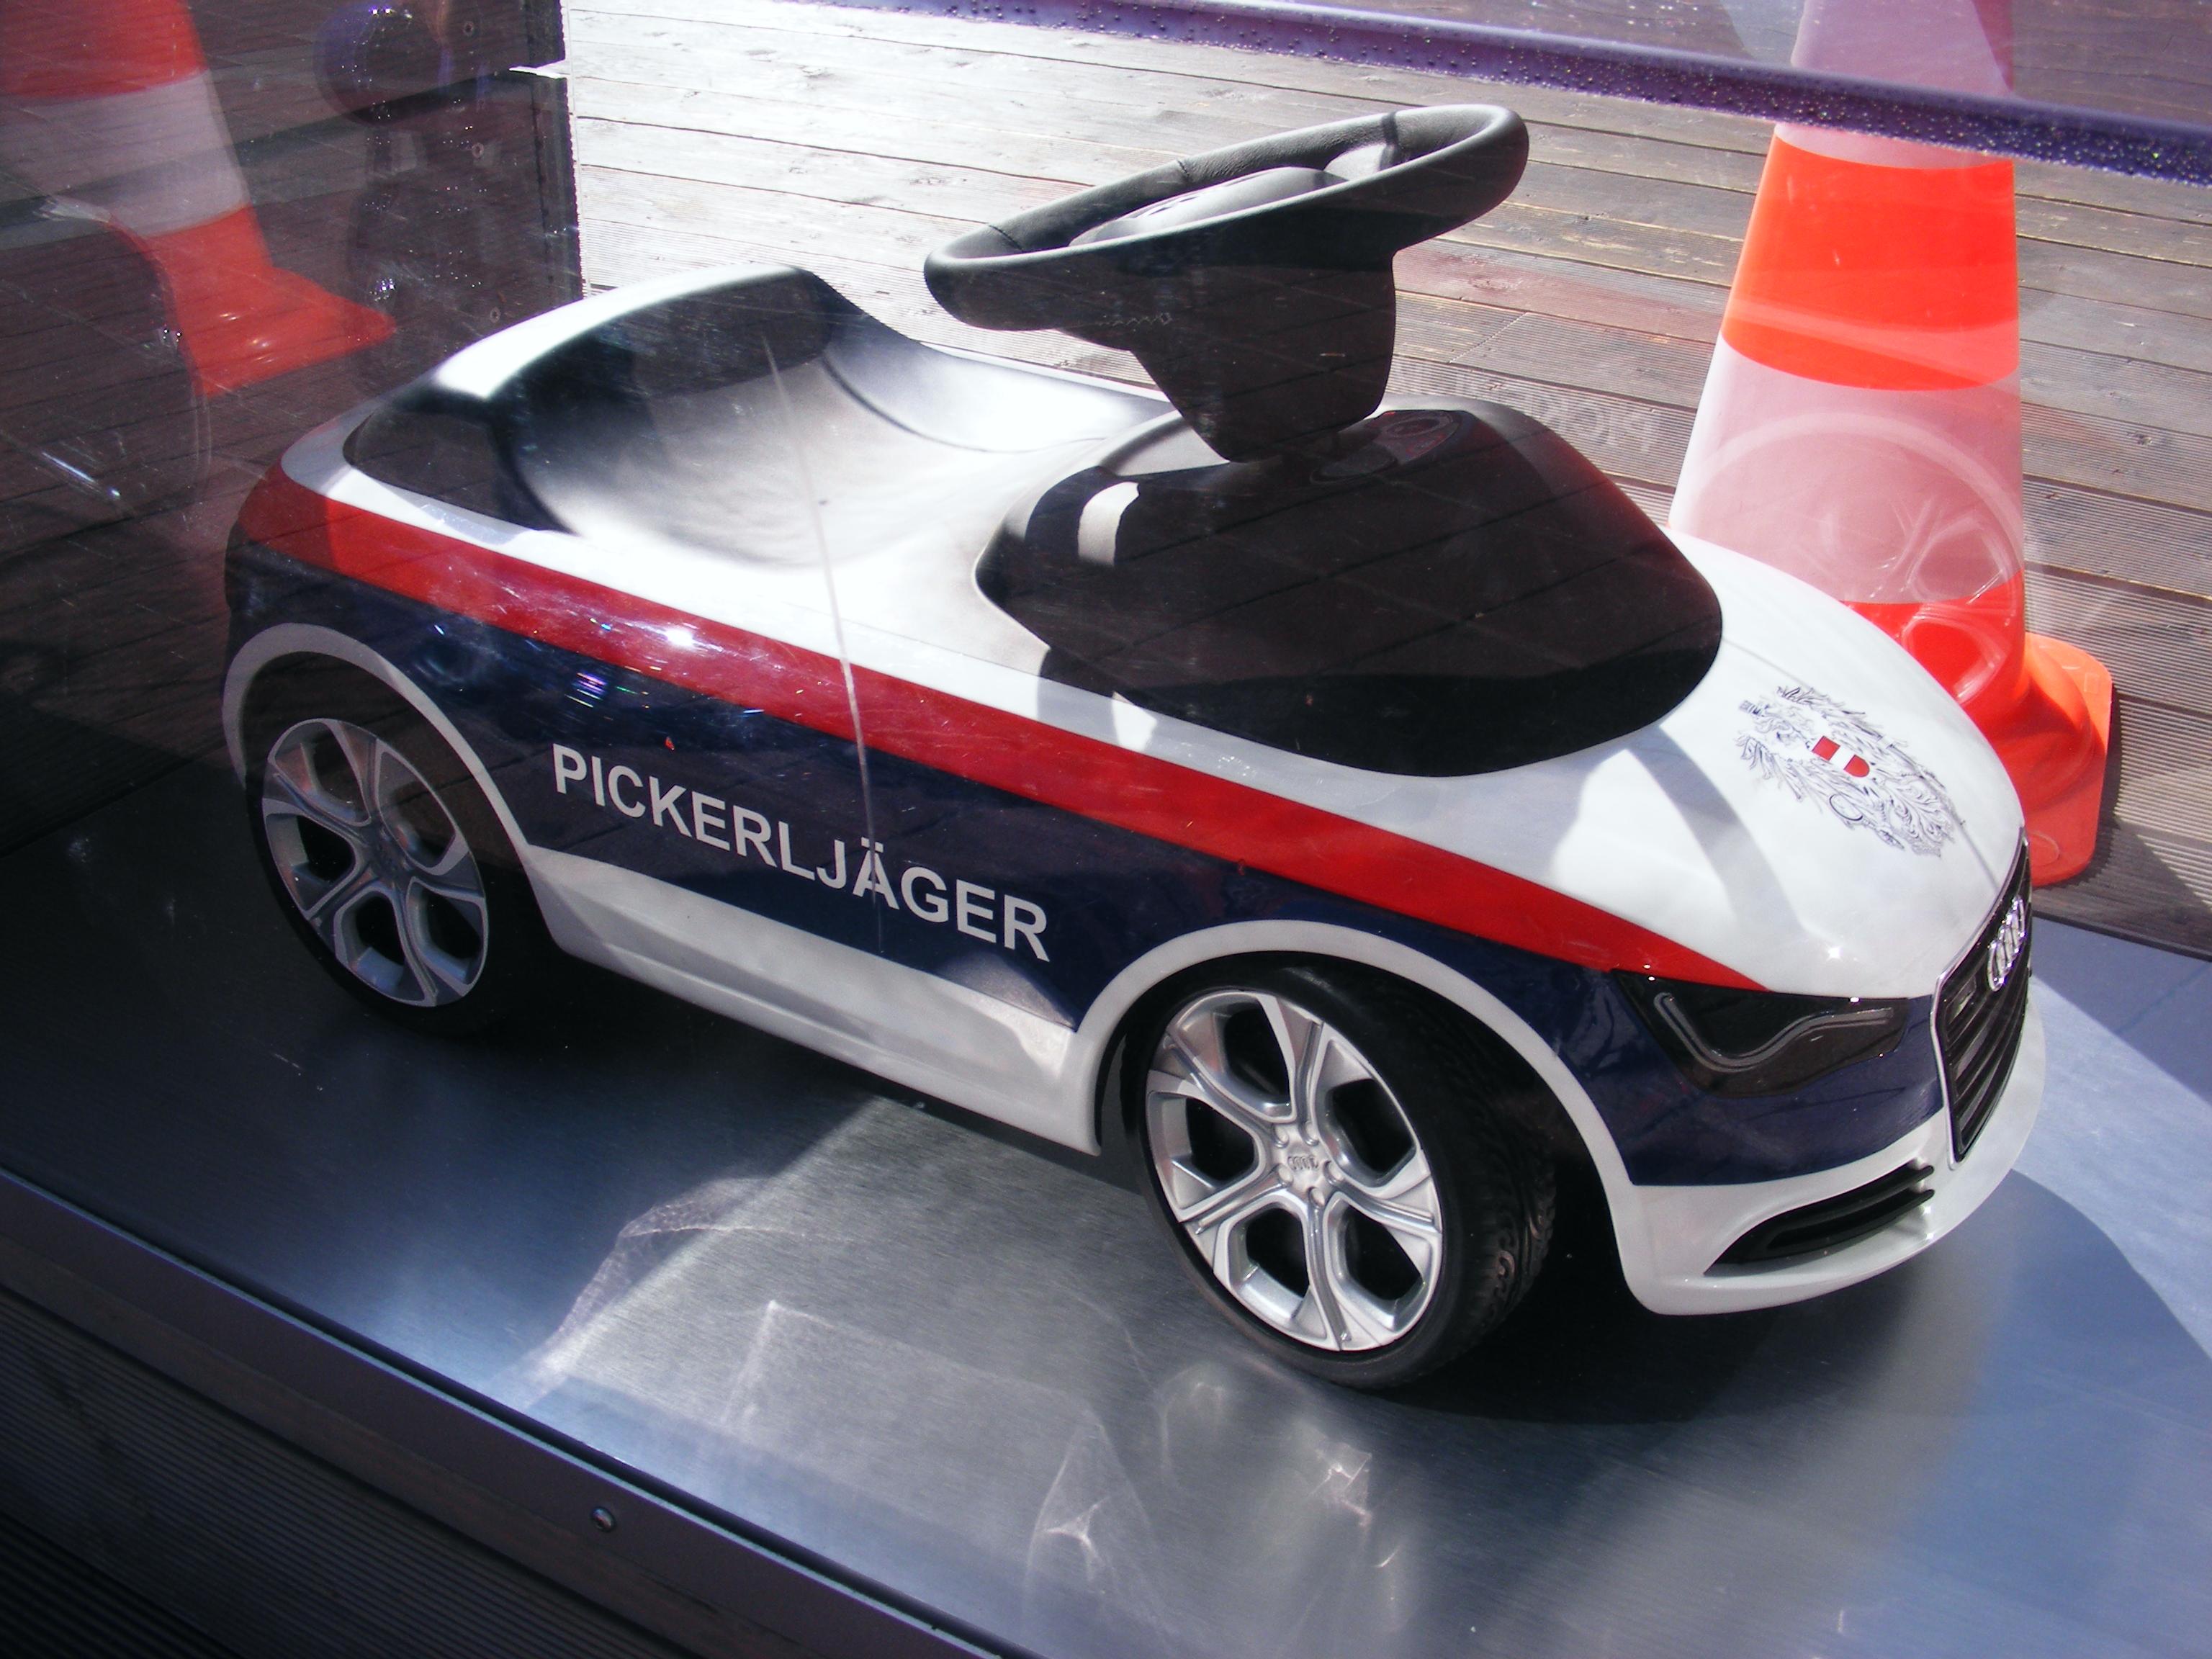 File Audi A1 Toy Car Pickerljager Jpg Wikimedia Commons